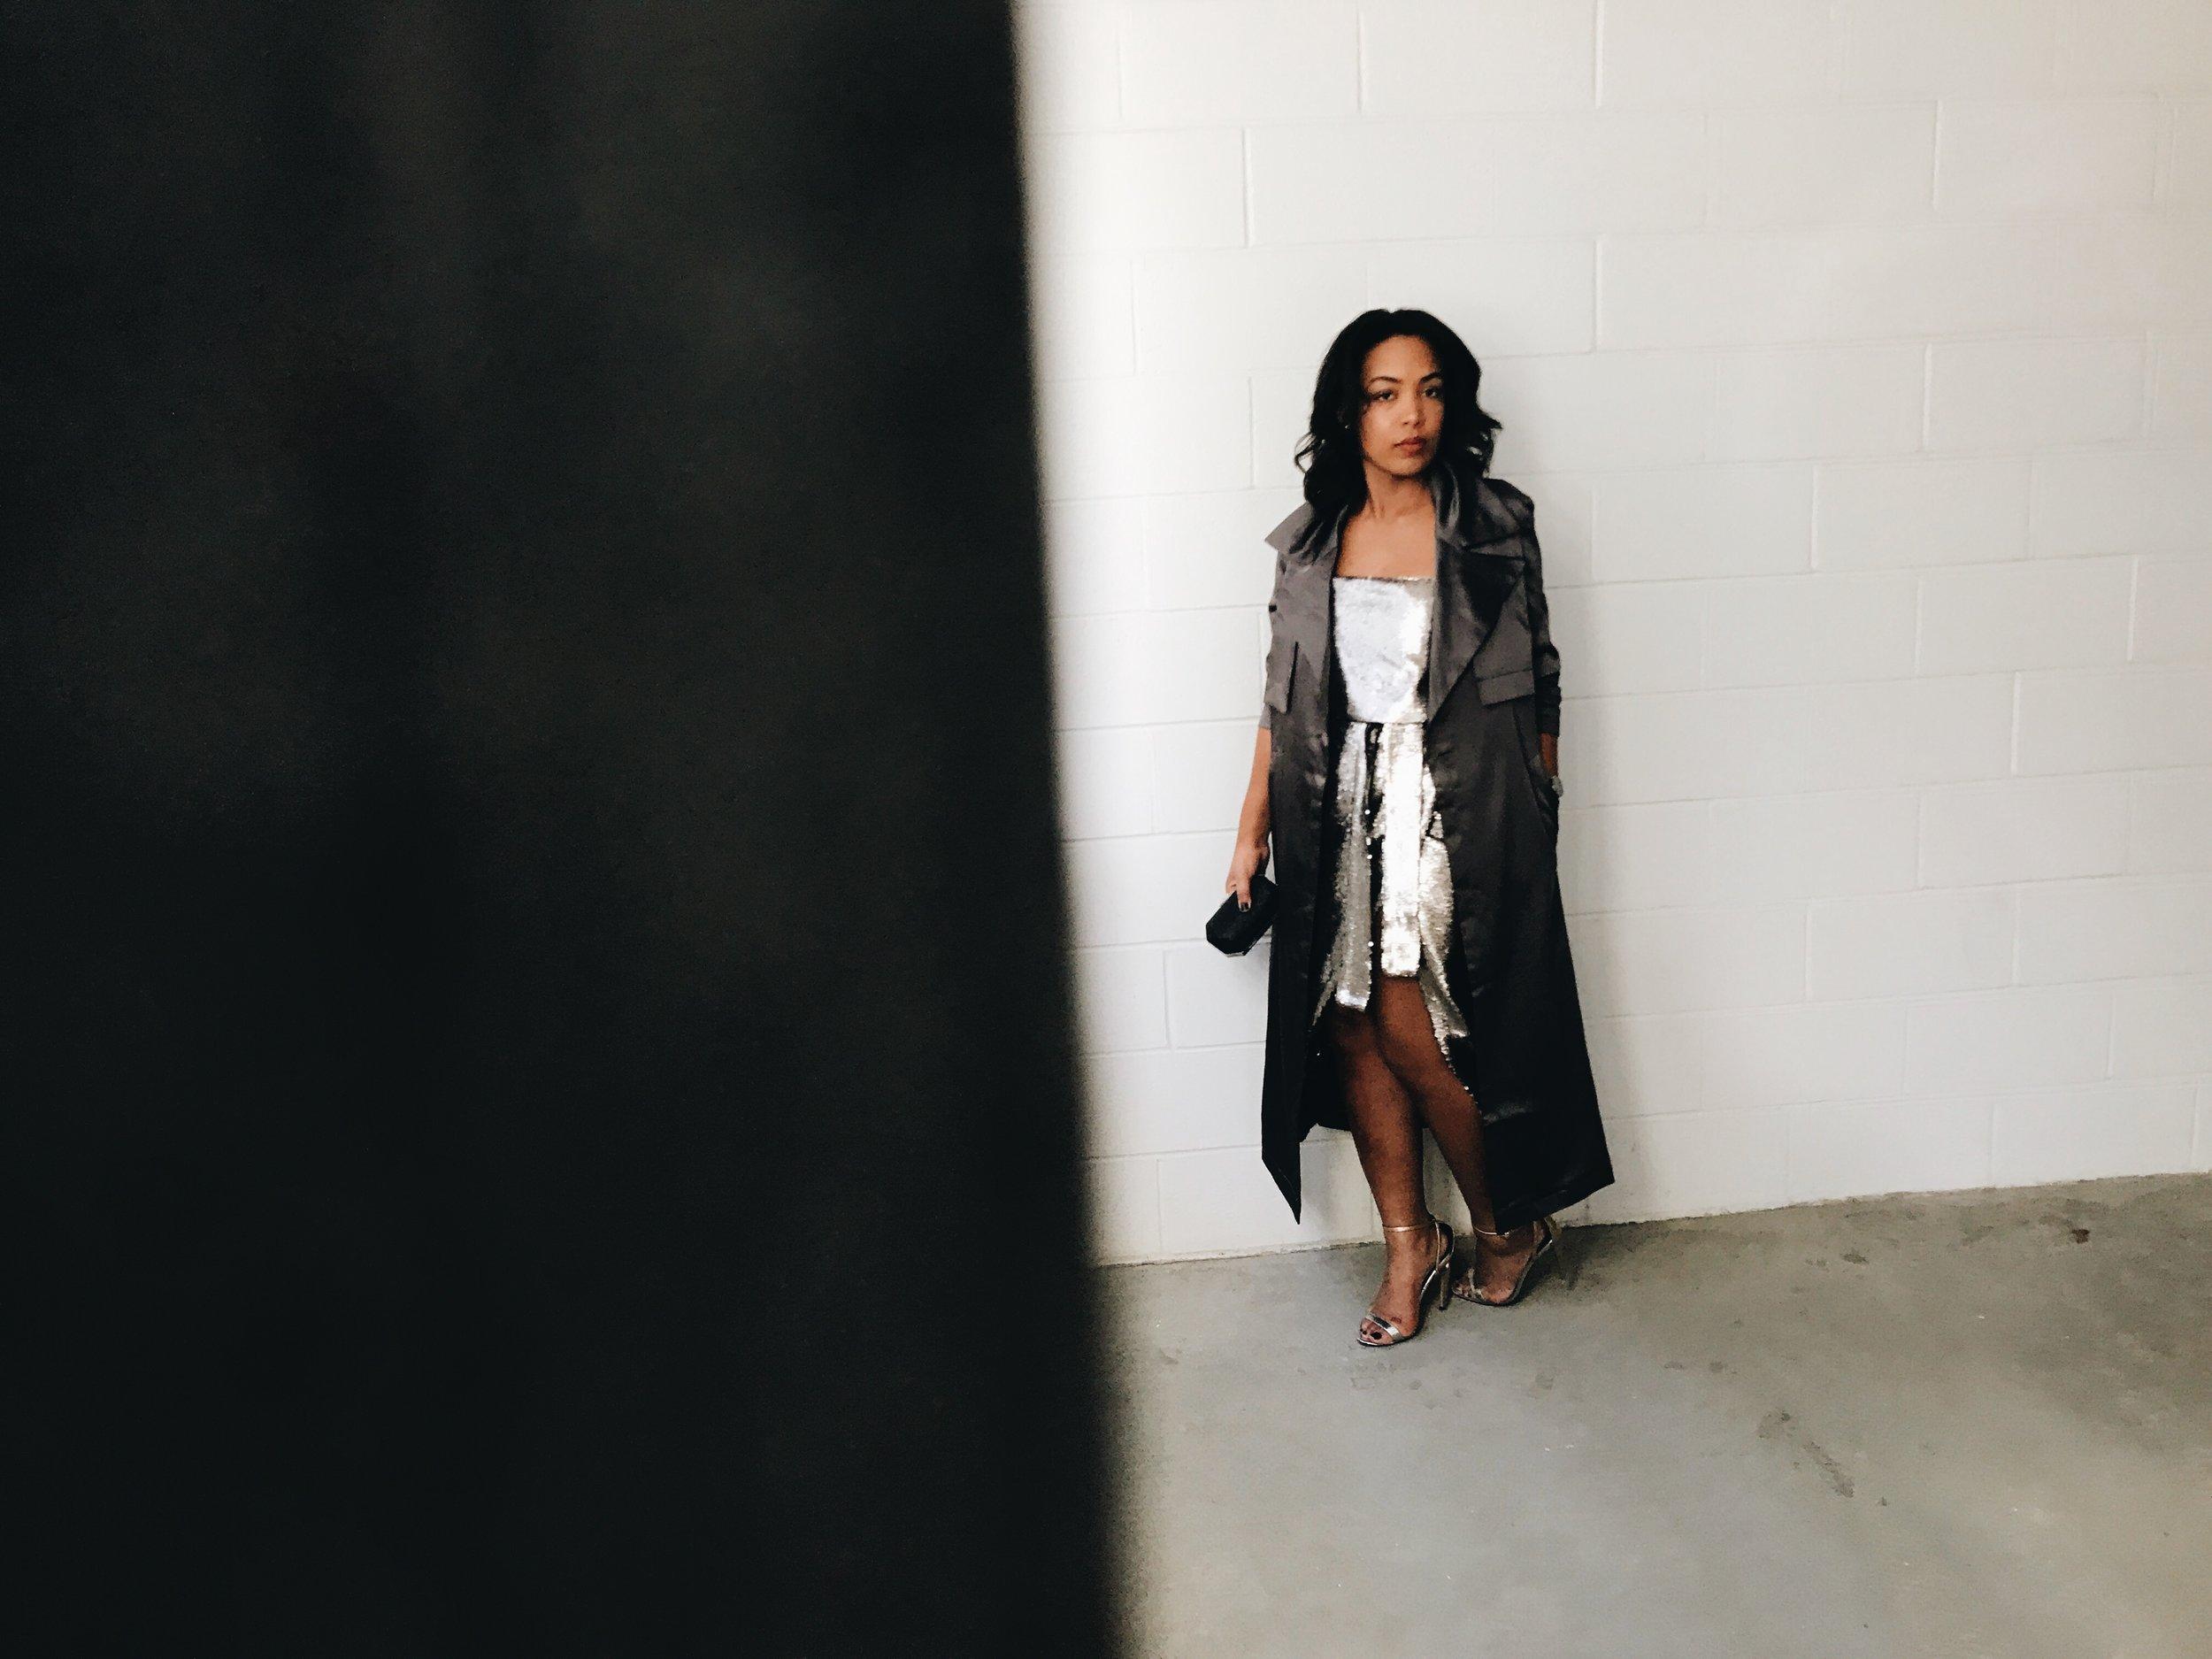 11-Lavish-Alice-Sequin-Dress-ASOS-Satin-Trench-Coat-Metallic-Heels-NYE-outfit.jpg